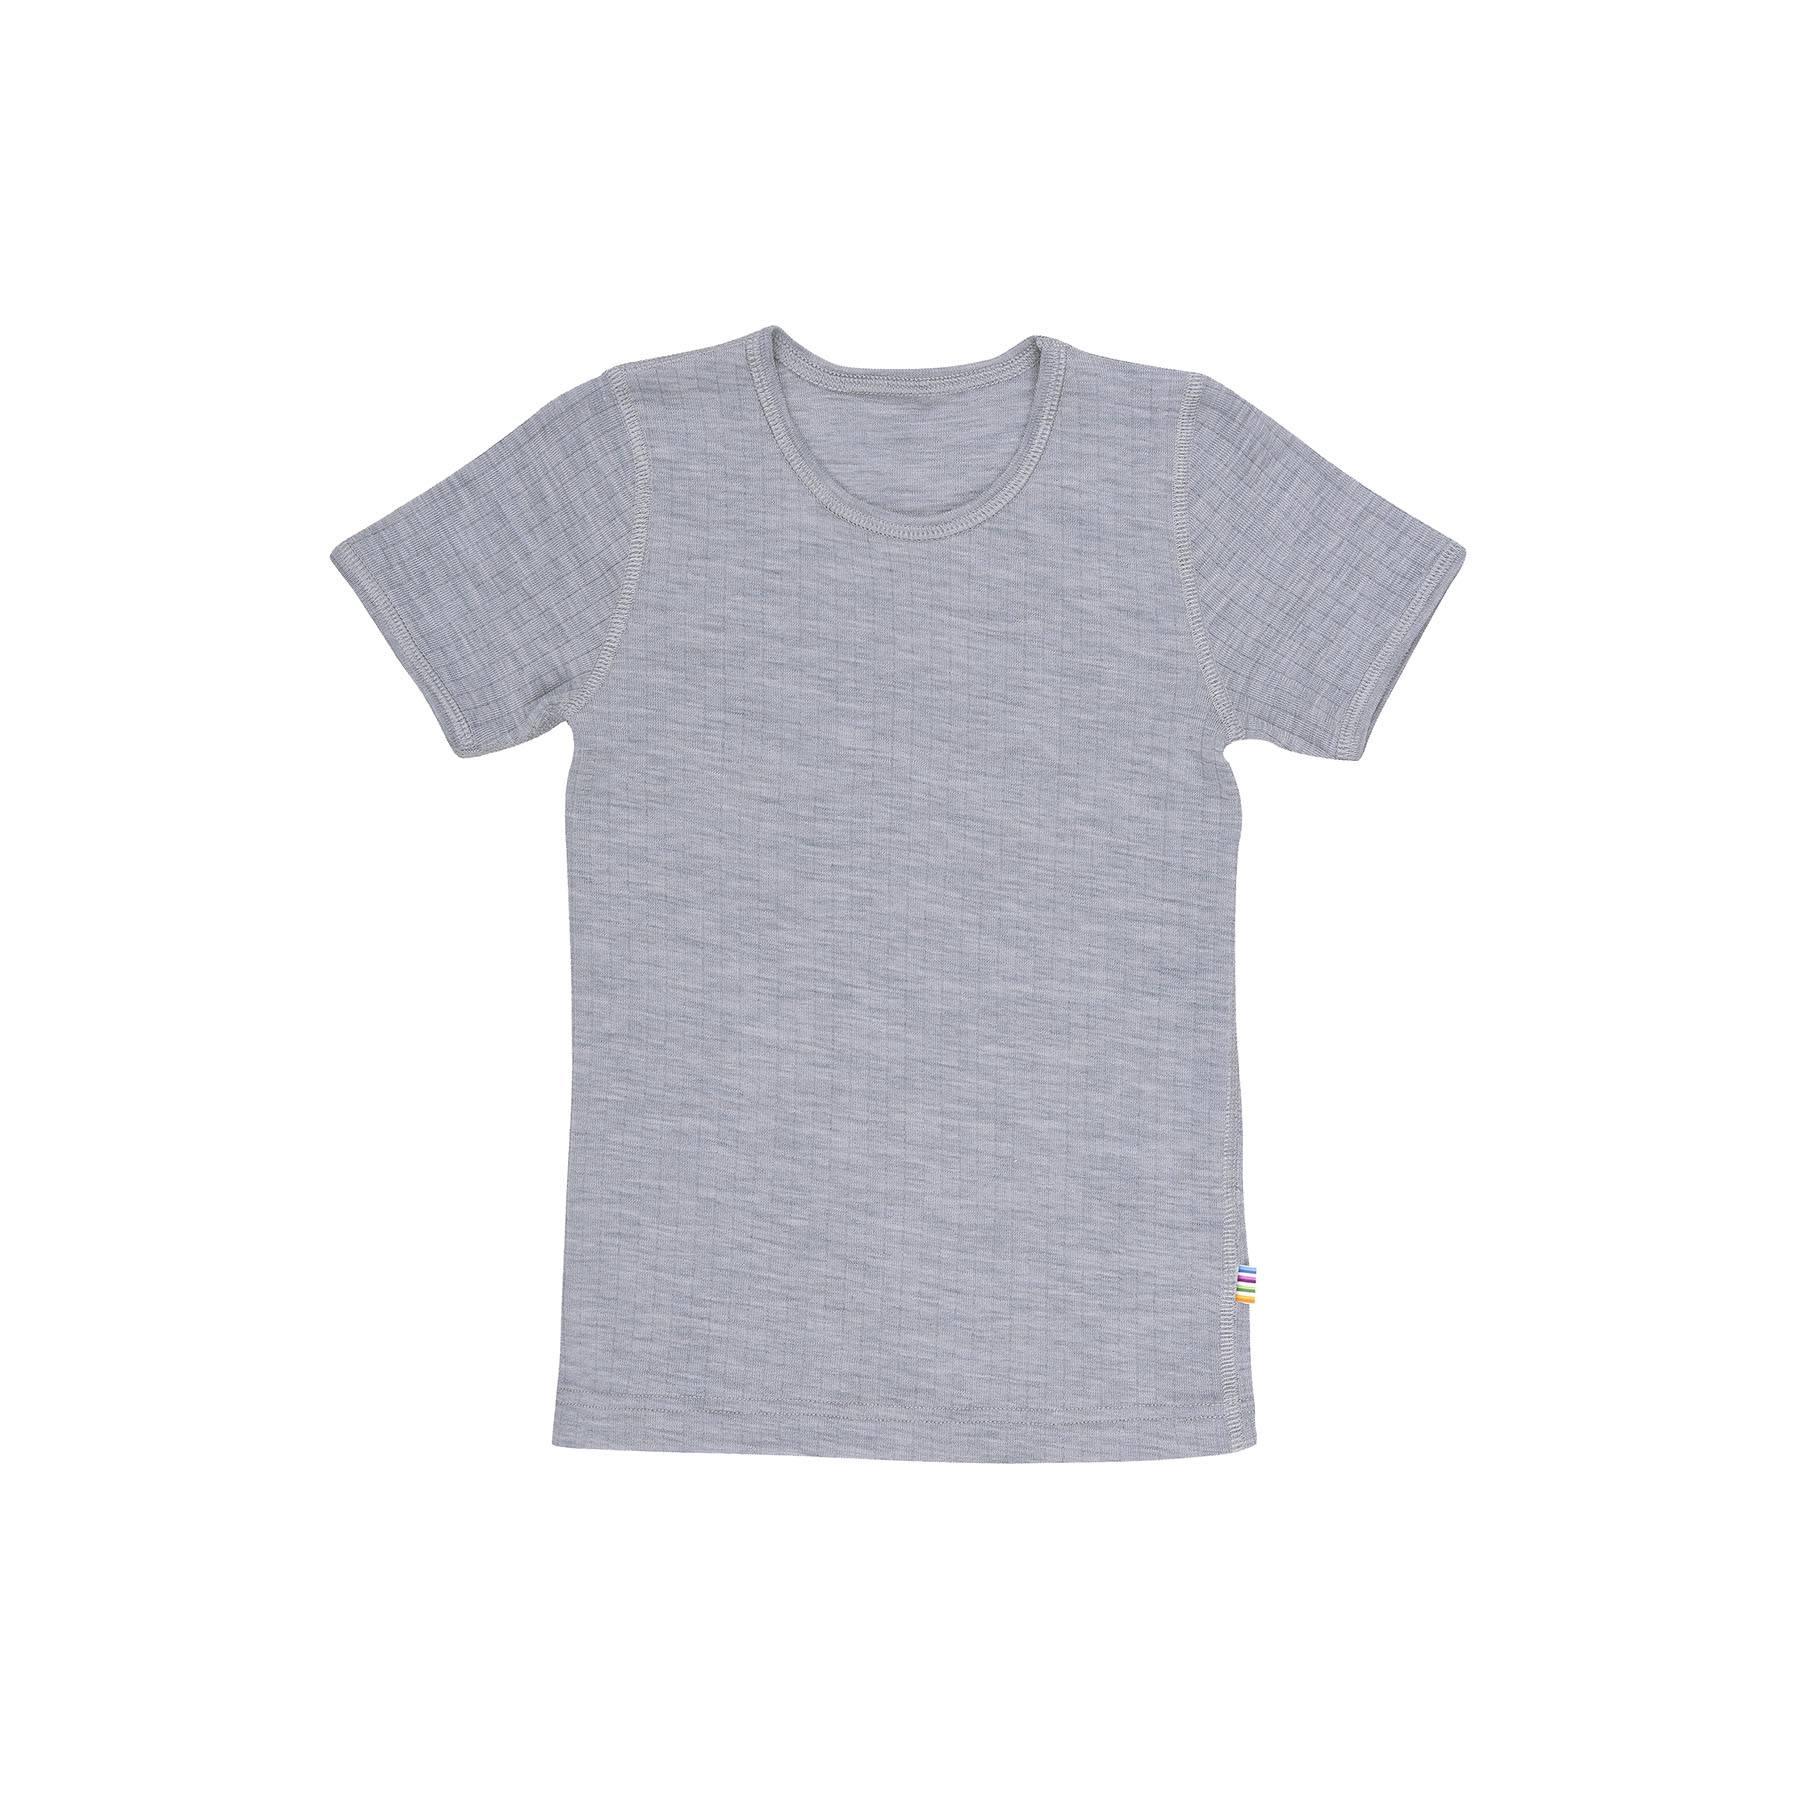 Joha T shirt til barn Uld Grå